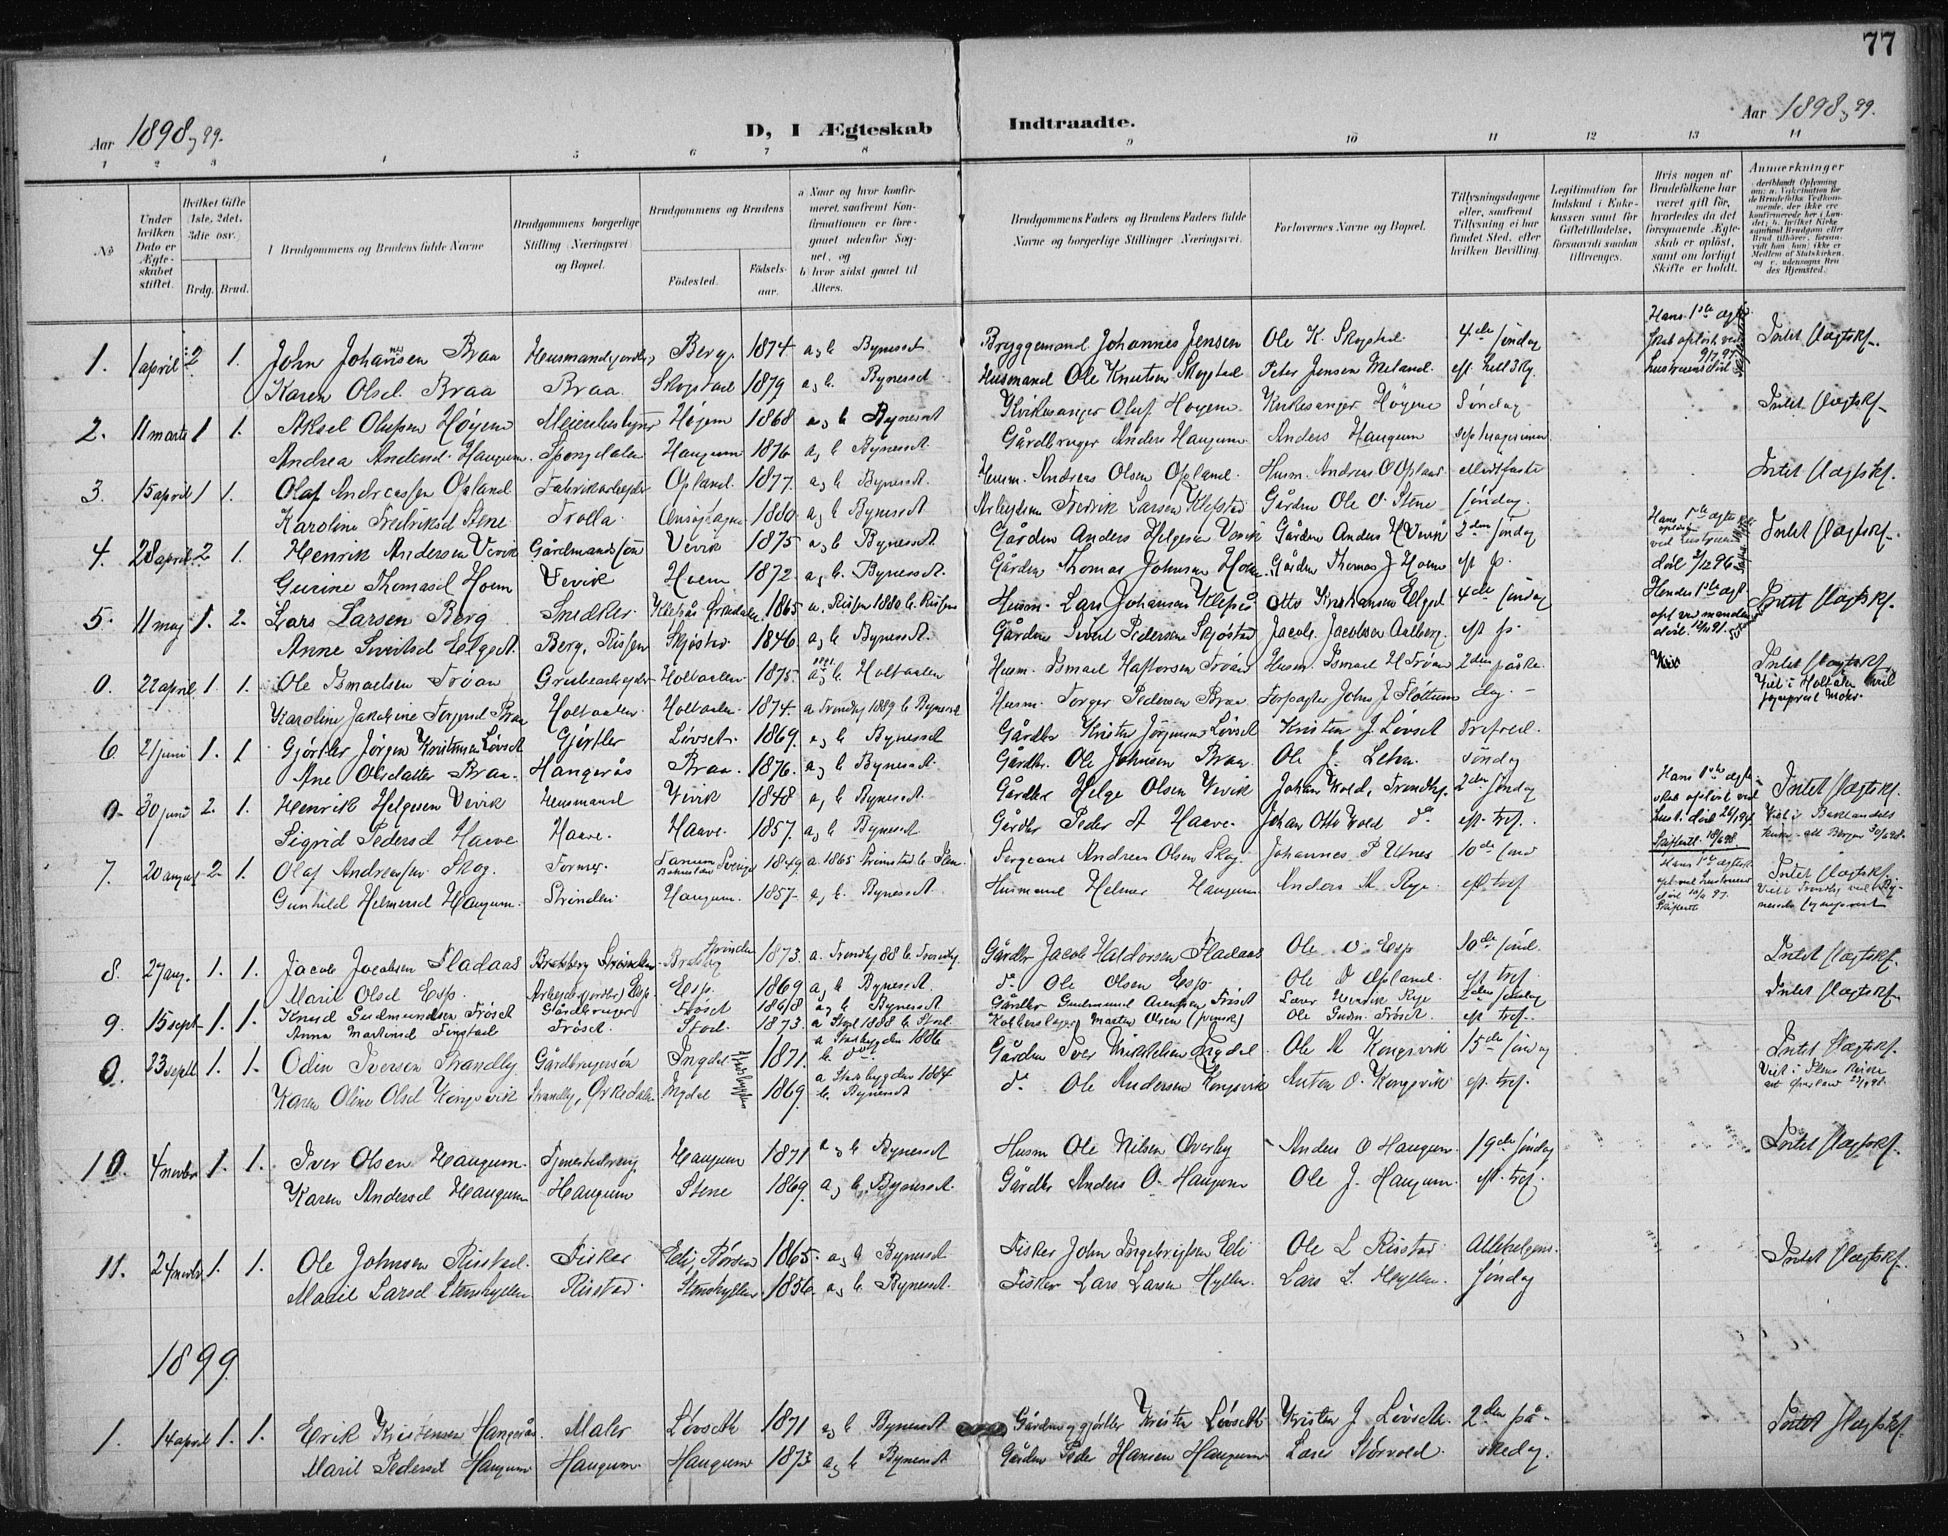 SAT, Ministerialprotokoller, klokkerbøker og fødselsregistre - Sør-Trøndelag, 612/L0380: Parish register (official) no. 612A12, 1898-1907, p. 77